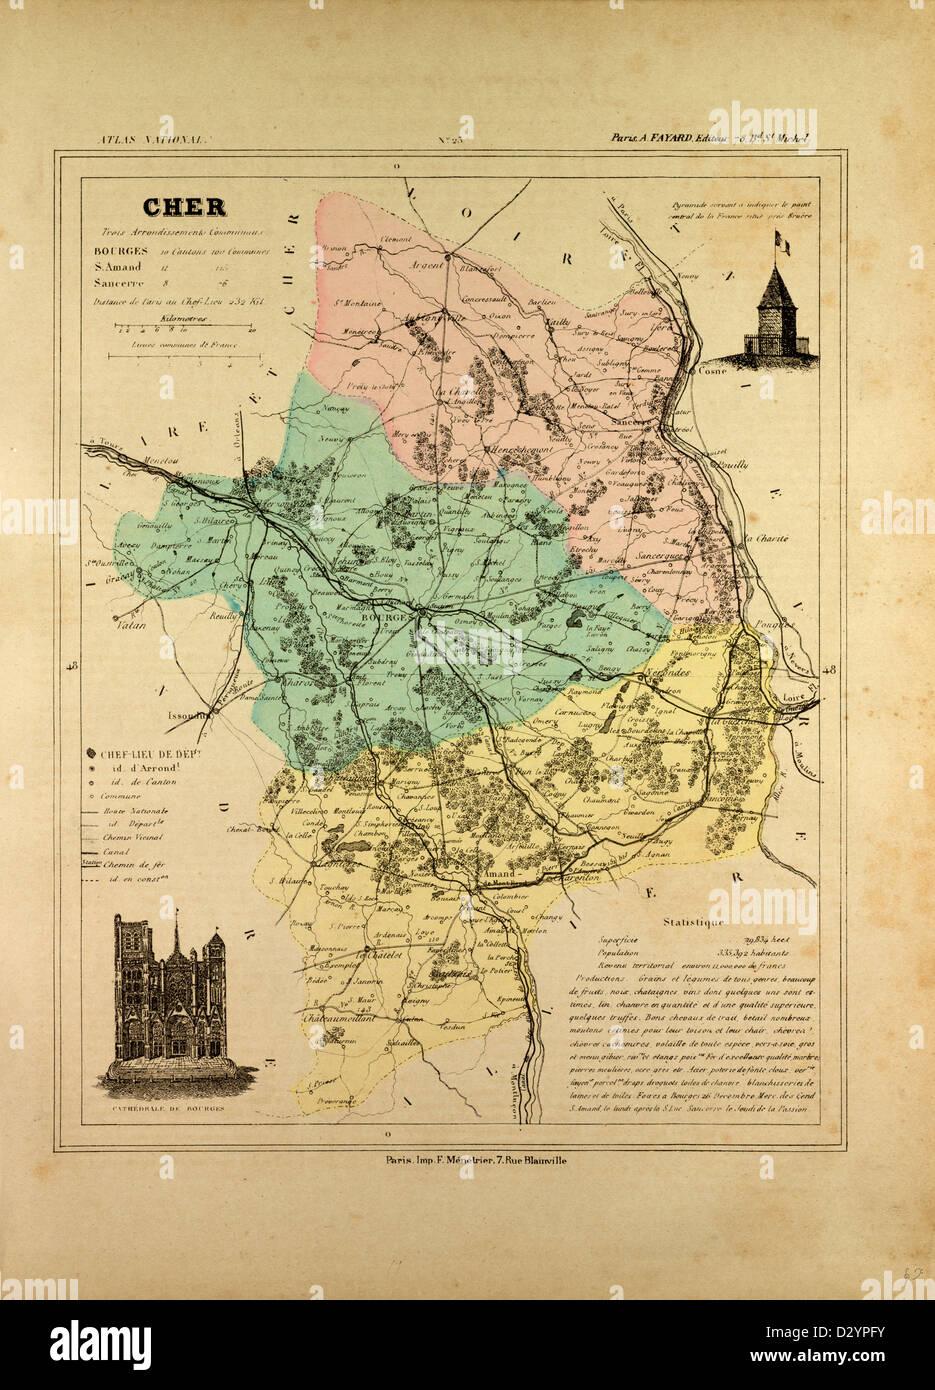 Sancerre France Map.Map Of Cher France Stock Photo 53470815 Alamy